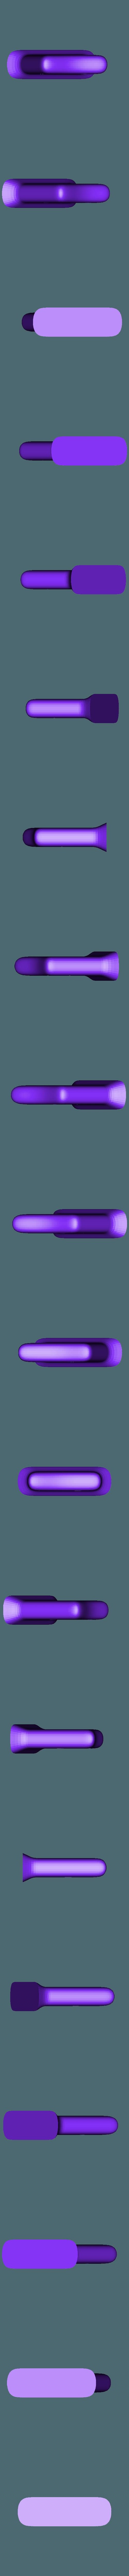 nachkriegsjugend1.STL Download free STL file gravestone concept - retourning the favour • 3D print model, syzguru11